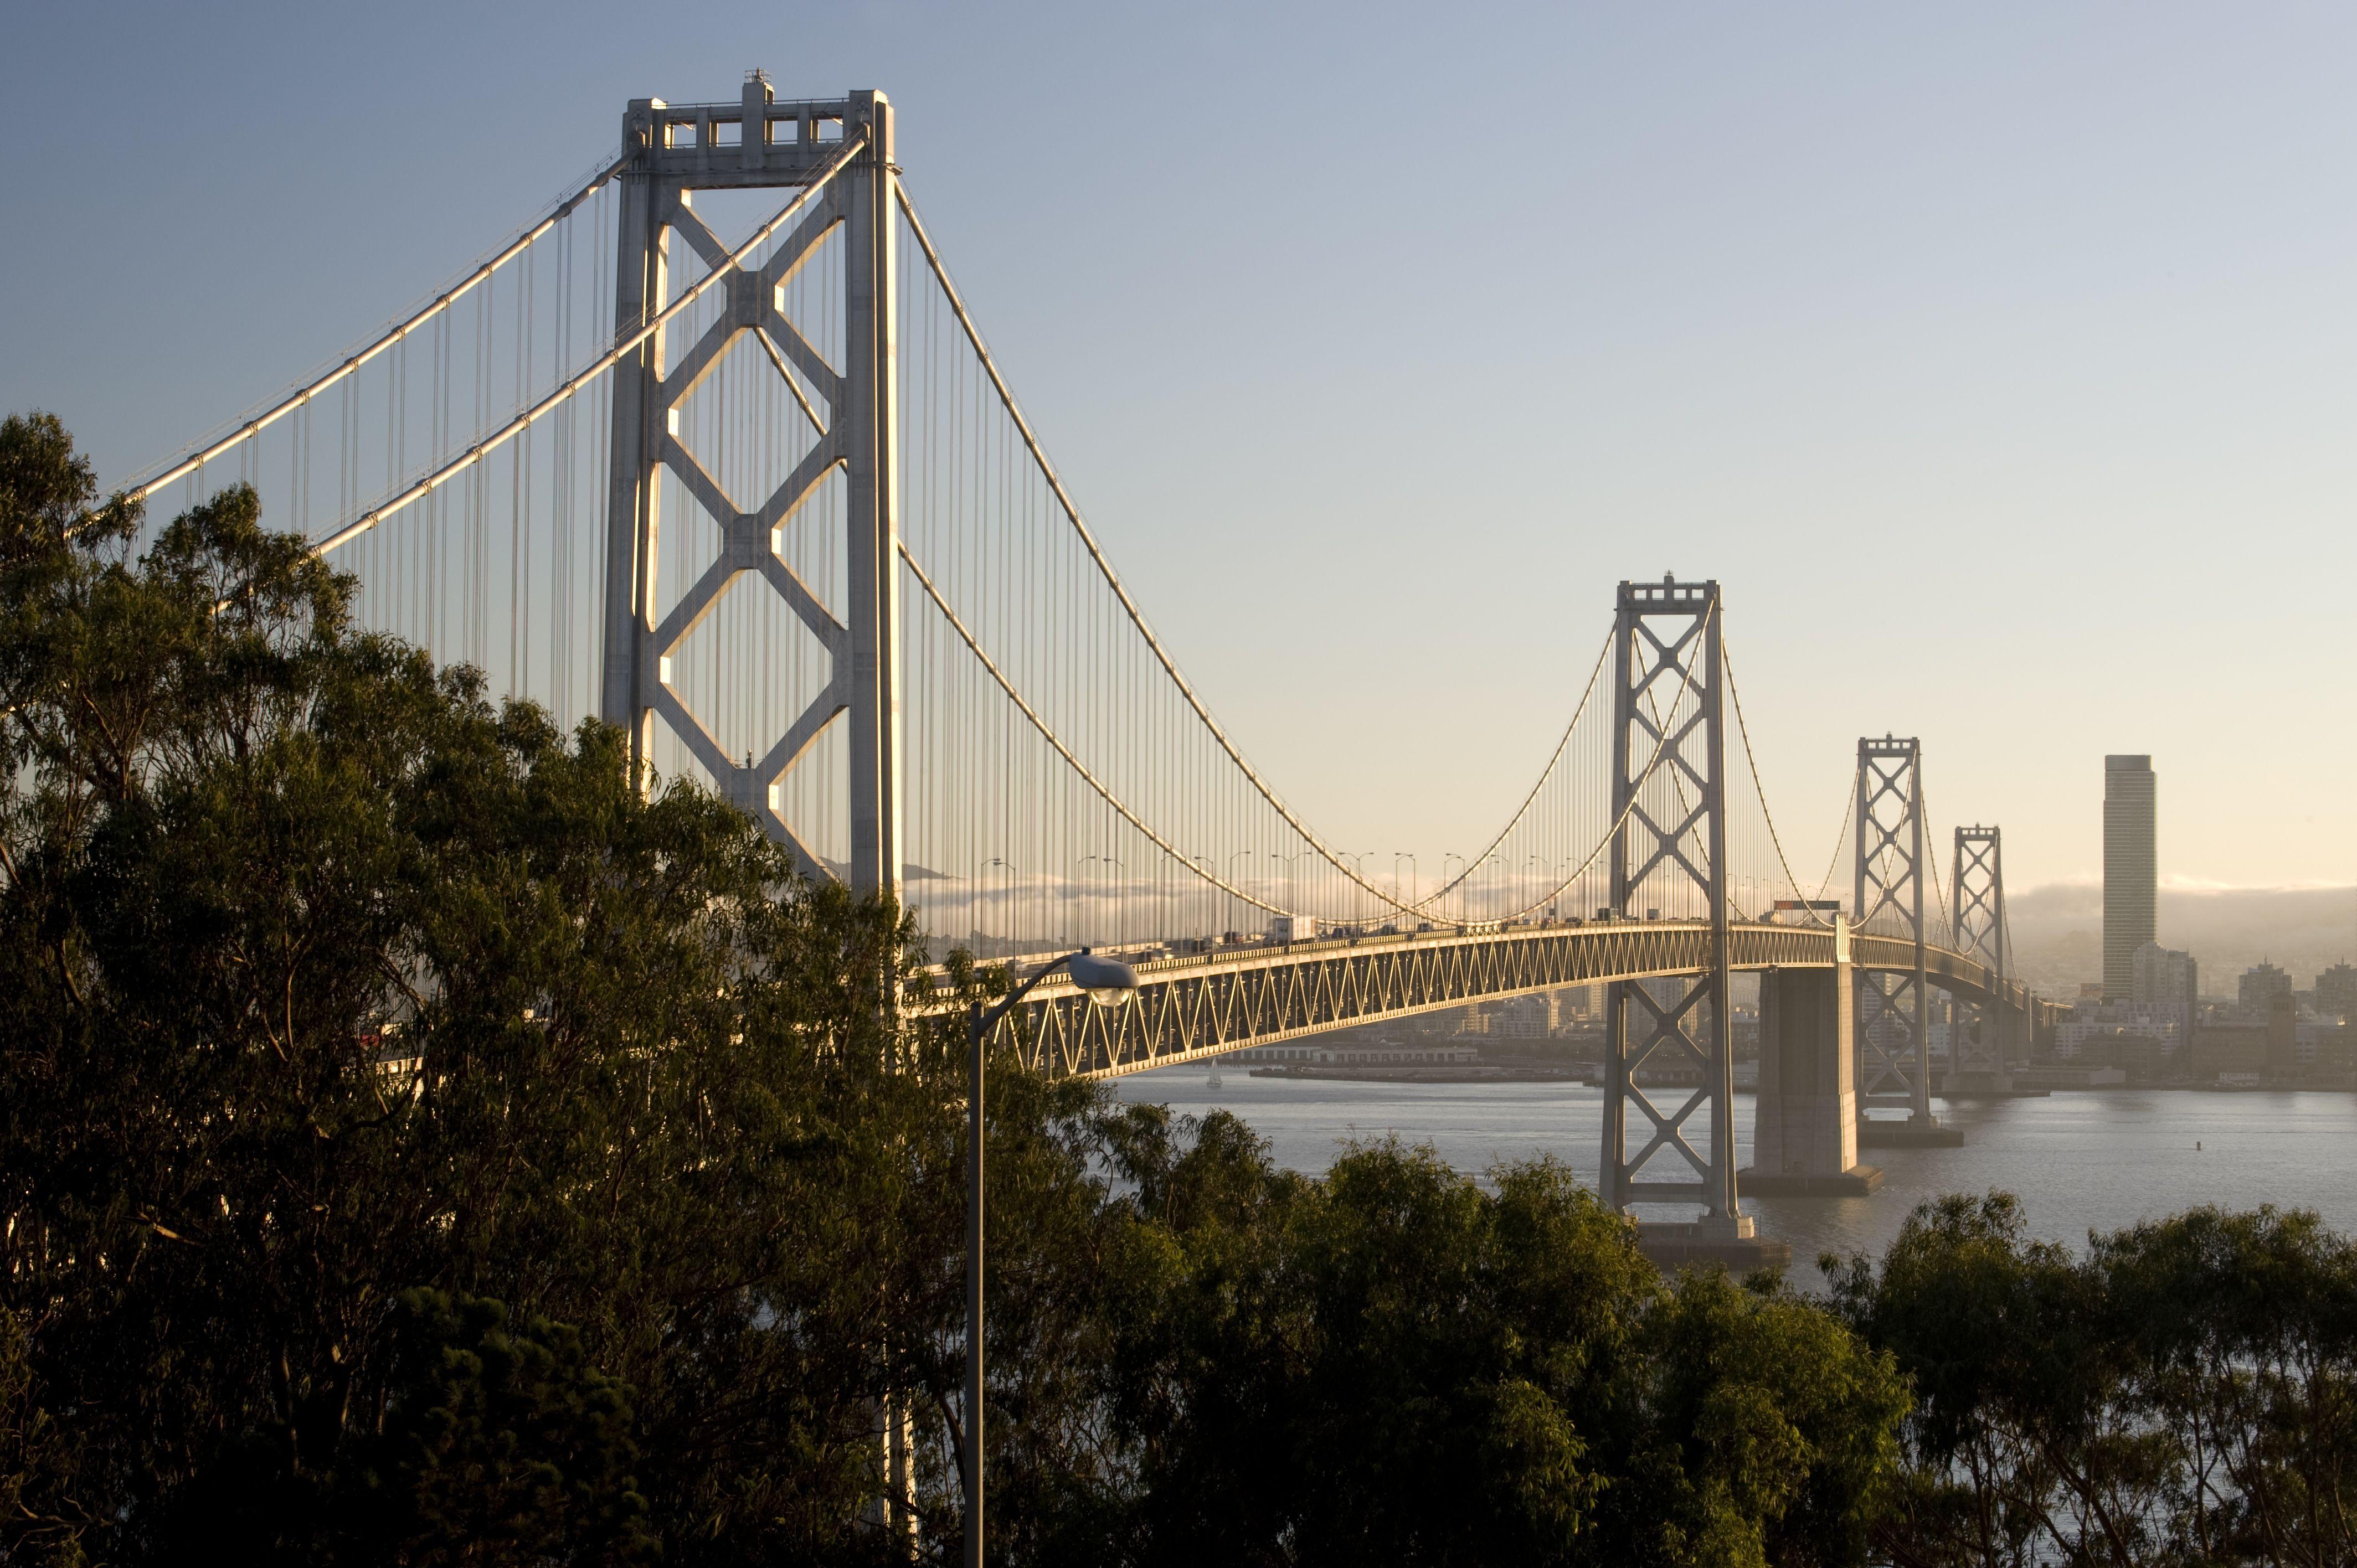 View of the San Francisco Bay Bridge from Treasure Island